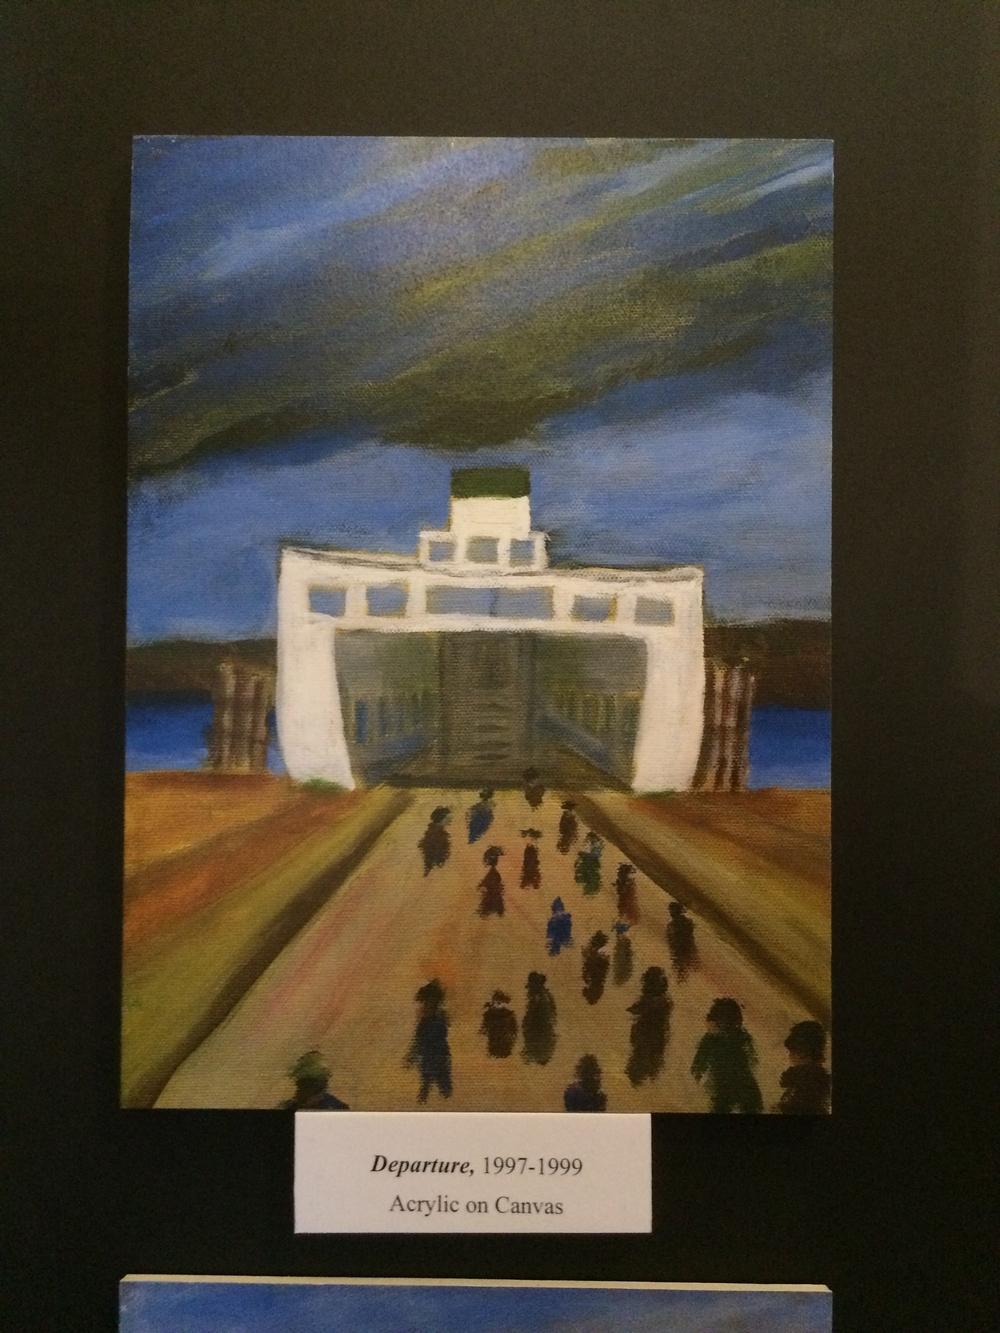 BainbridgeHistoricalMuseum 13.JPG